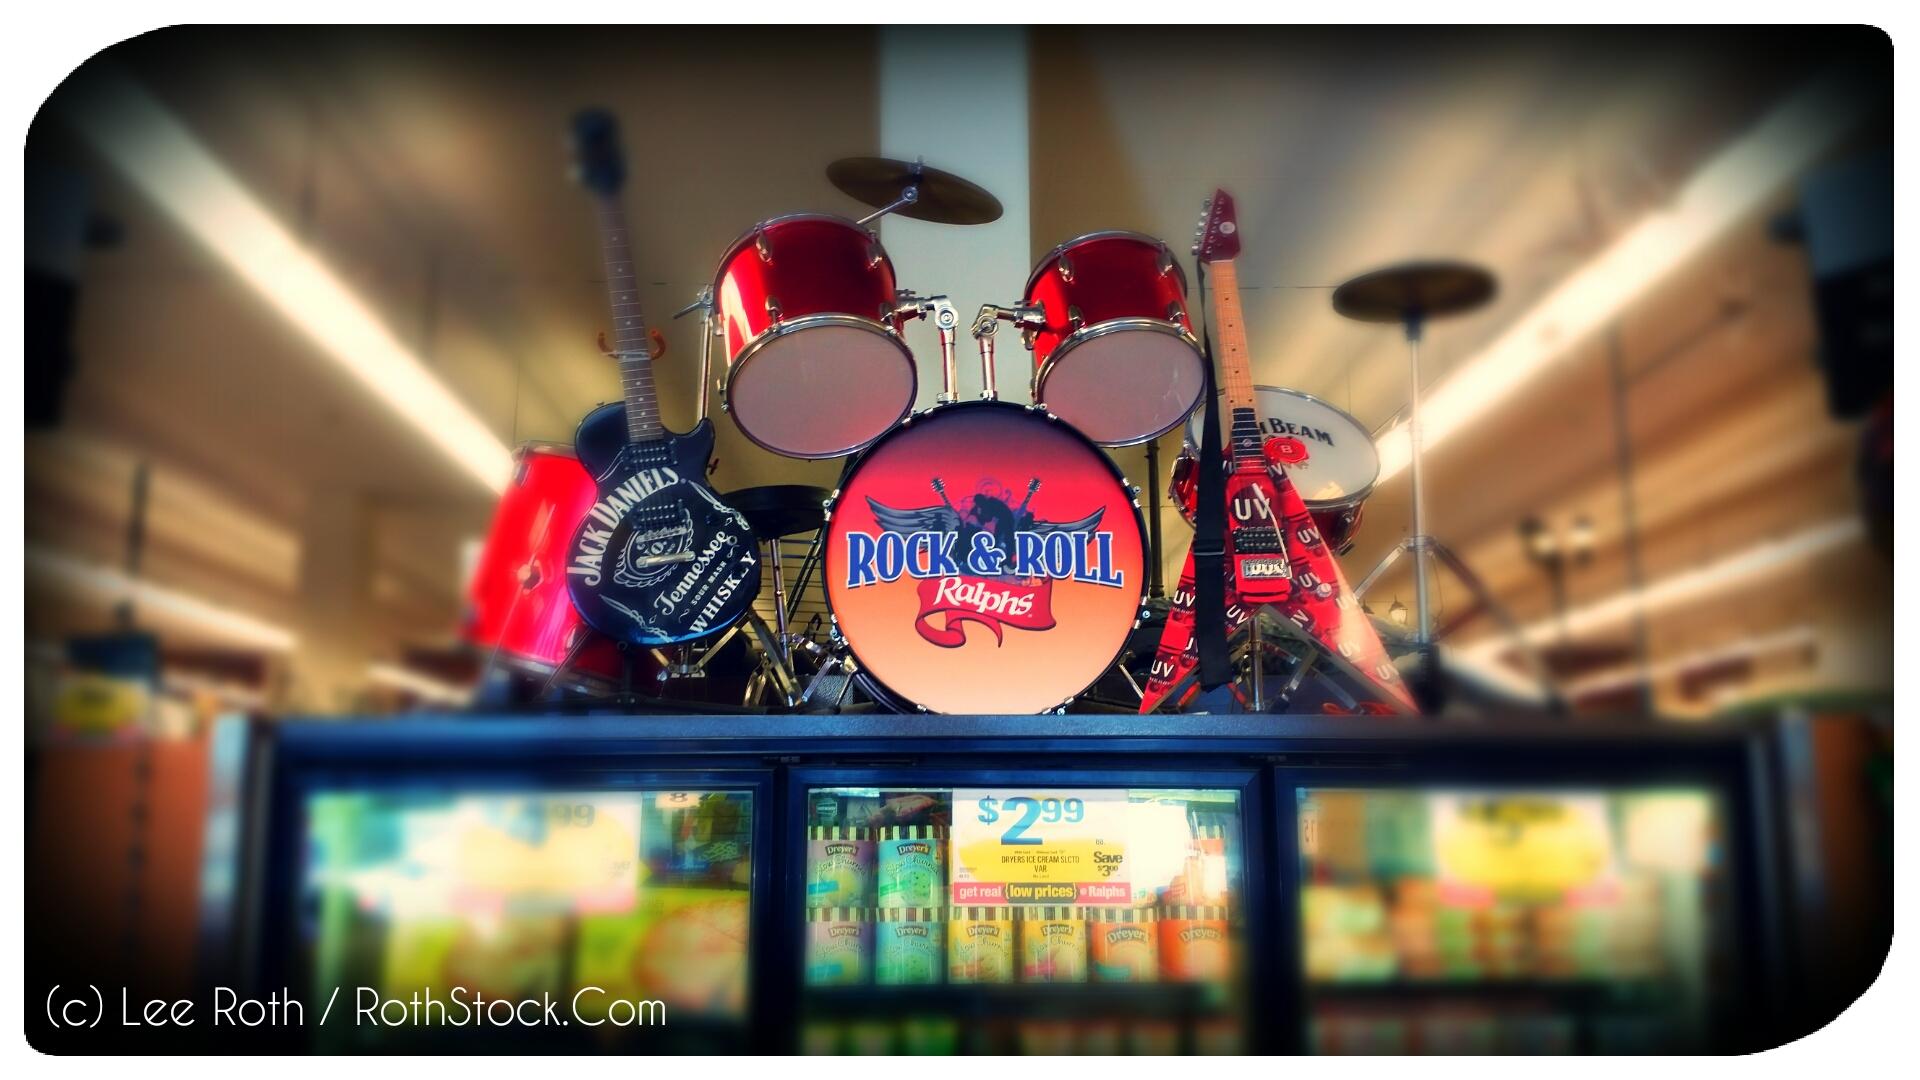 Rock N Roll Ralphs